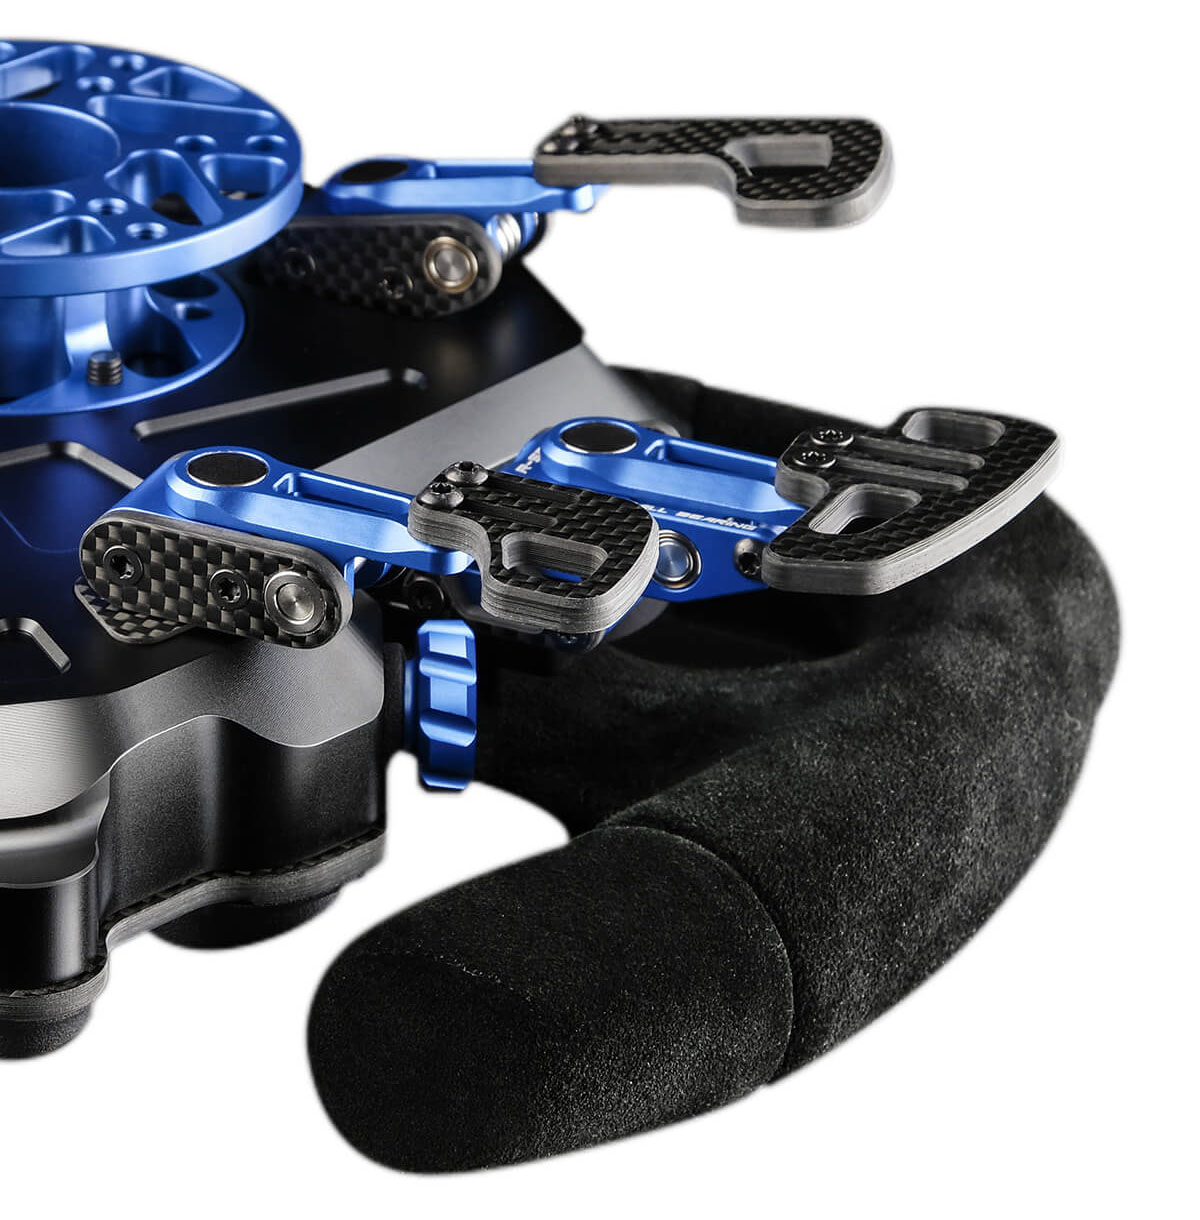 shop.gperformance.eu - Cube Controls GT-X Grand Tourer wheel - rear iso view - cut - G-Performance